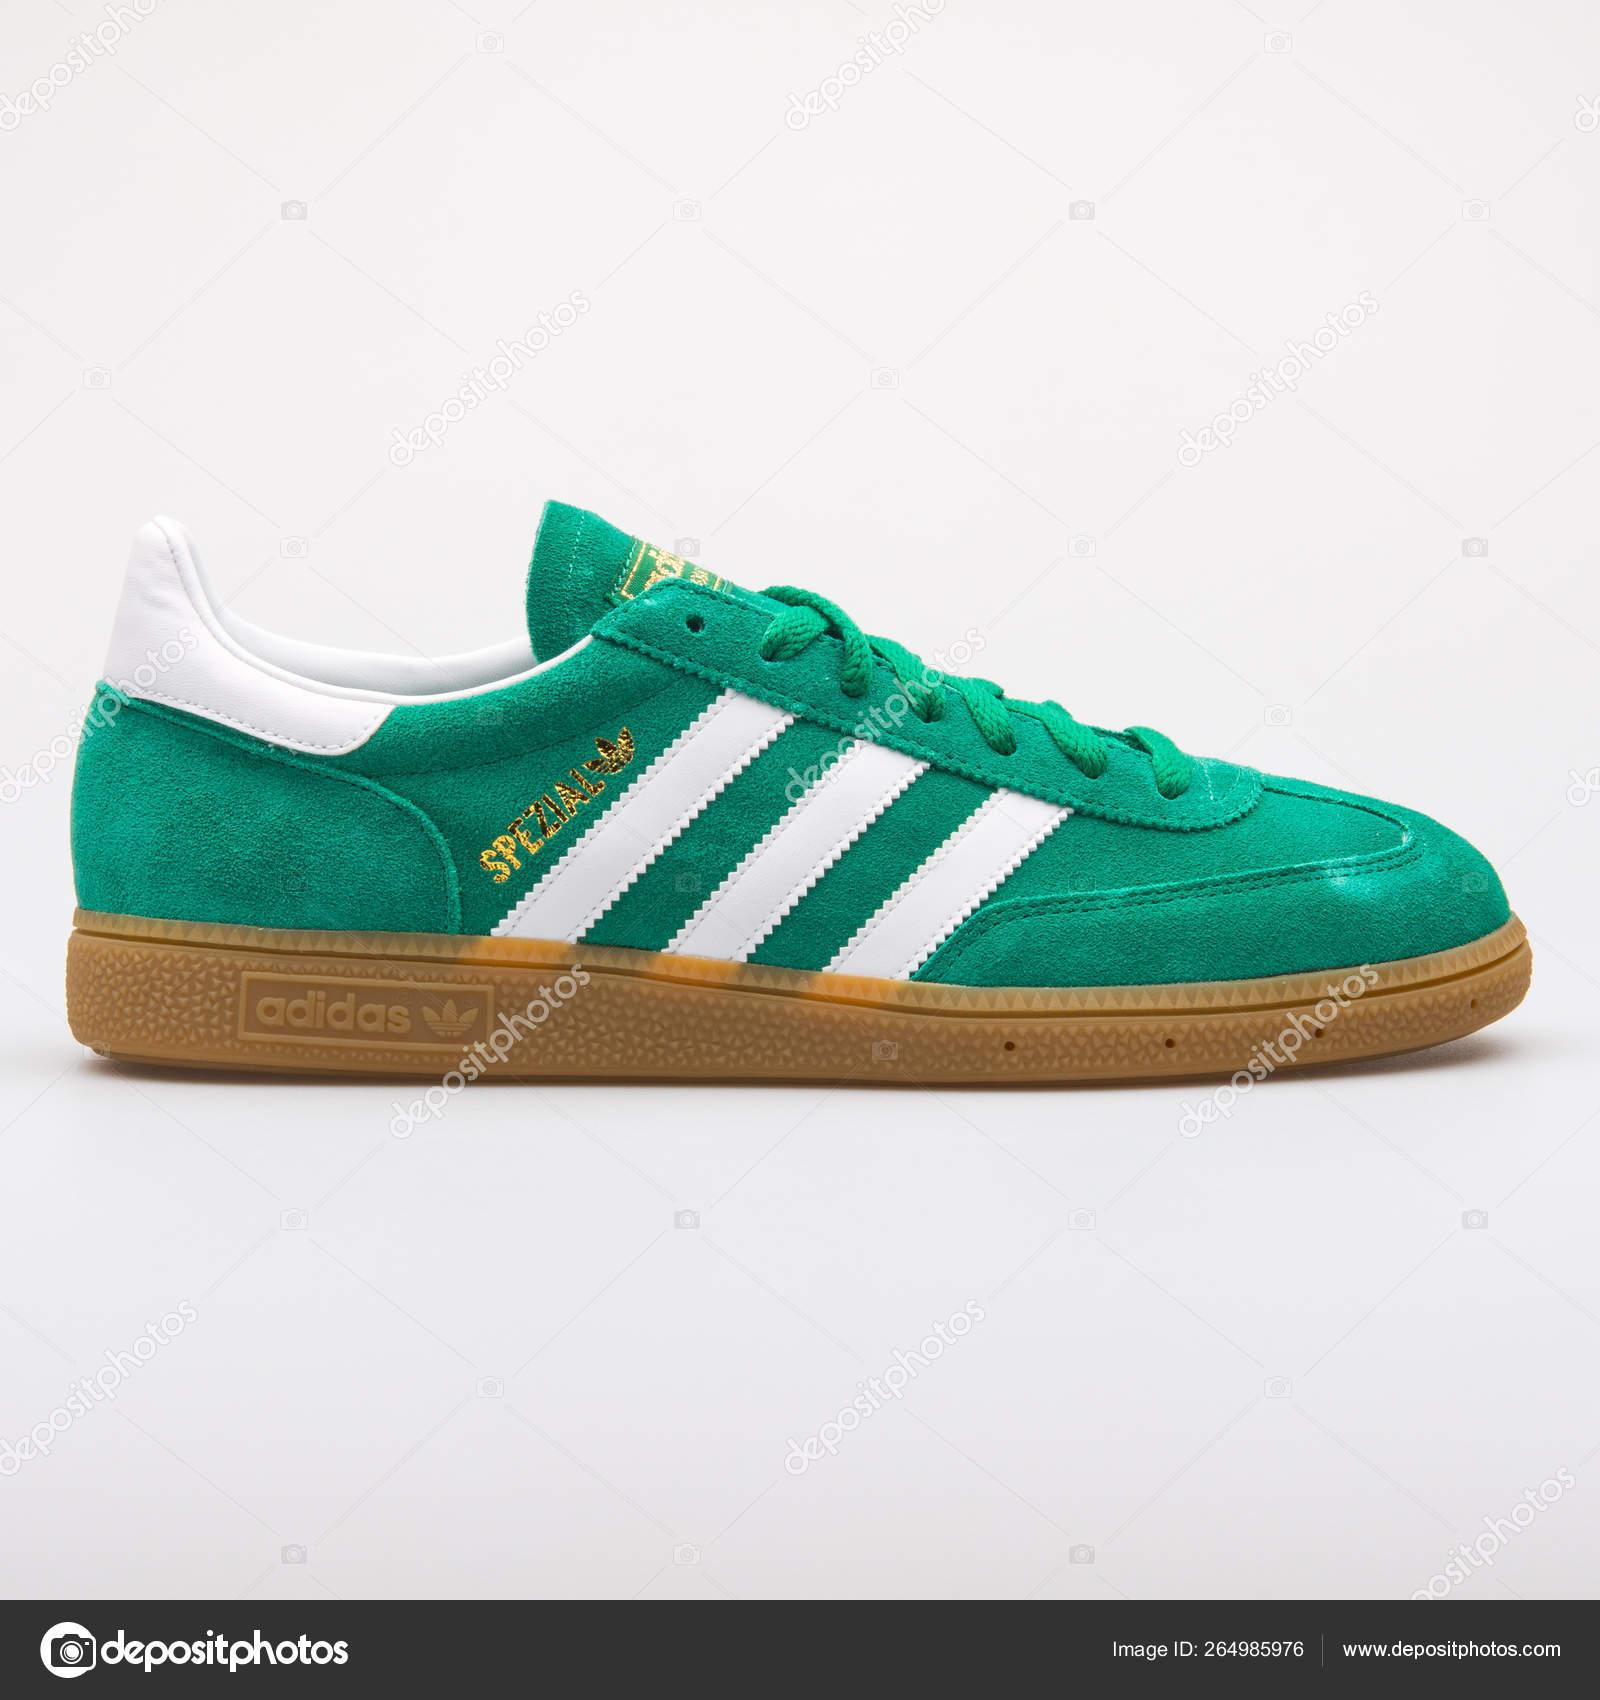 Adidas Spezial green and white sneaker